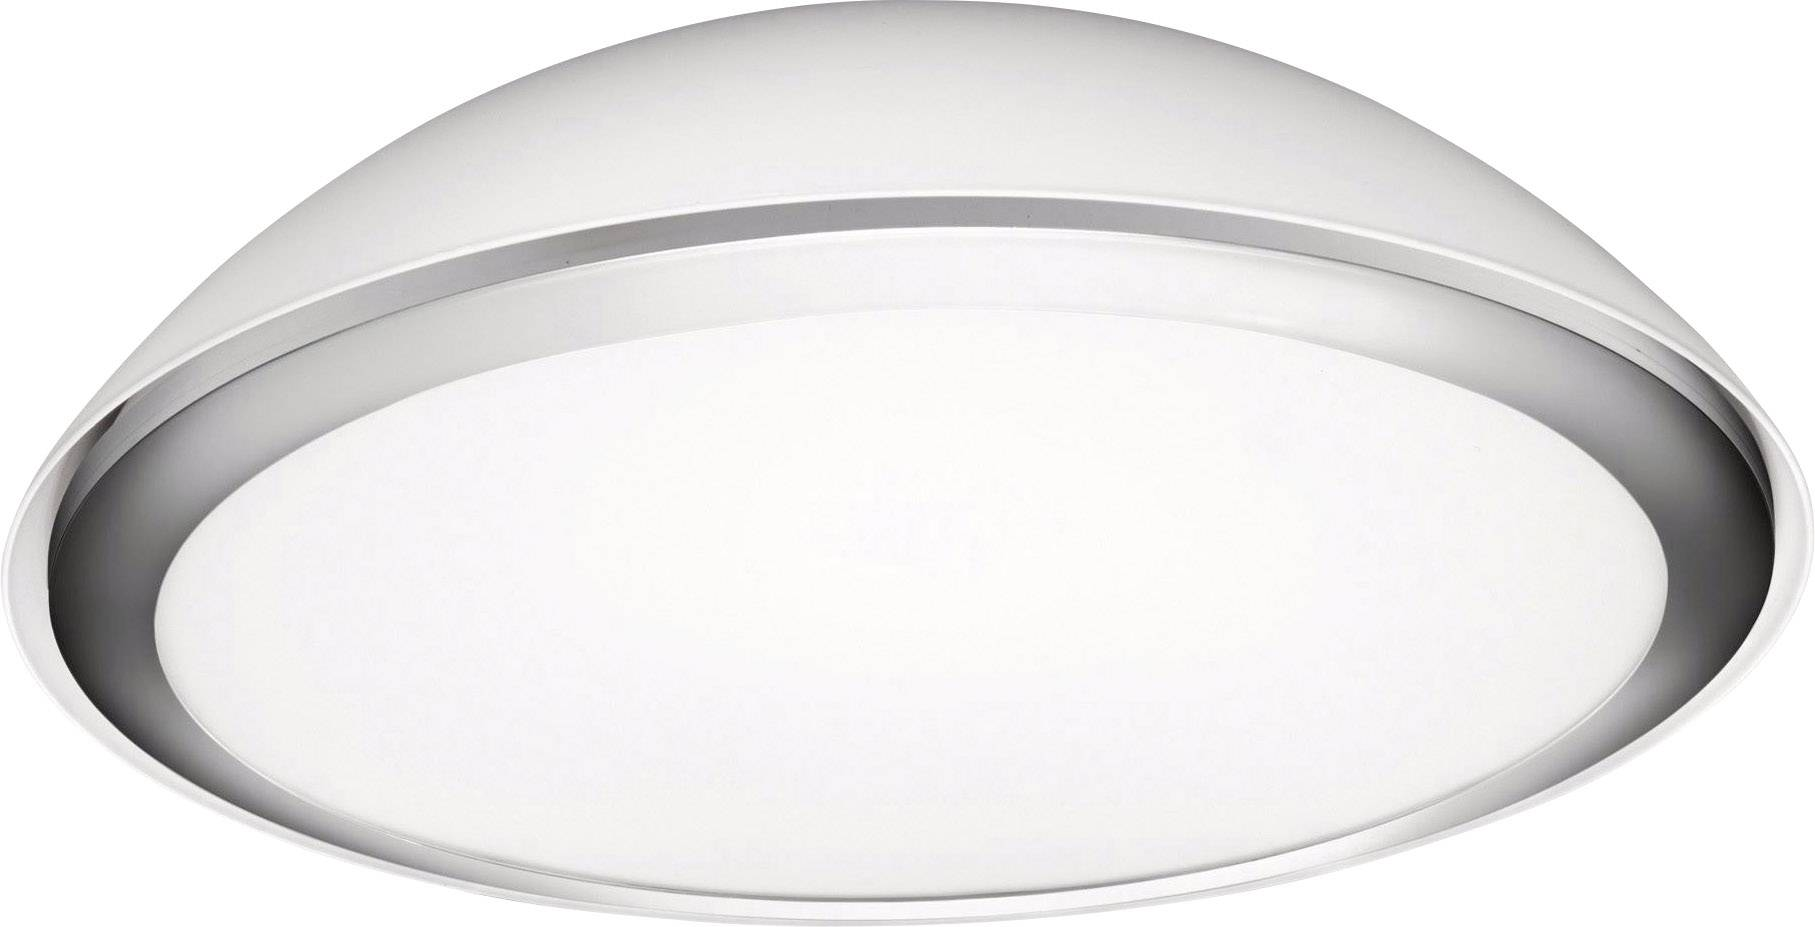 Led plafondlamp voor badkamer w warm wit philips lighting